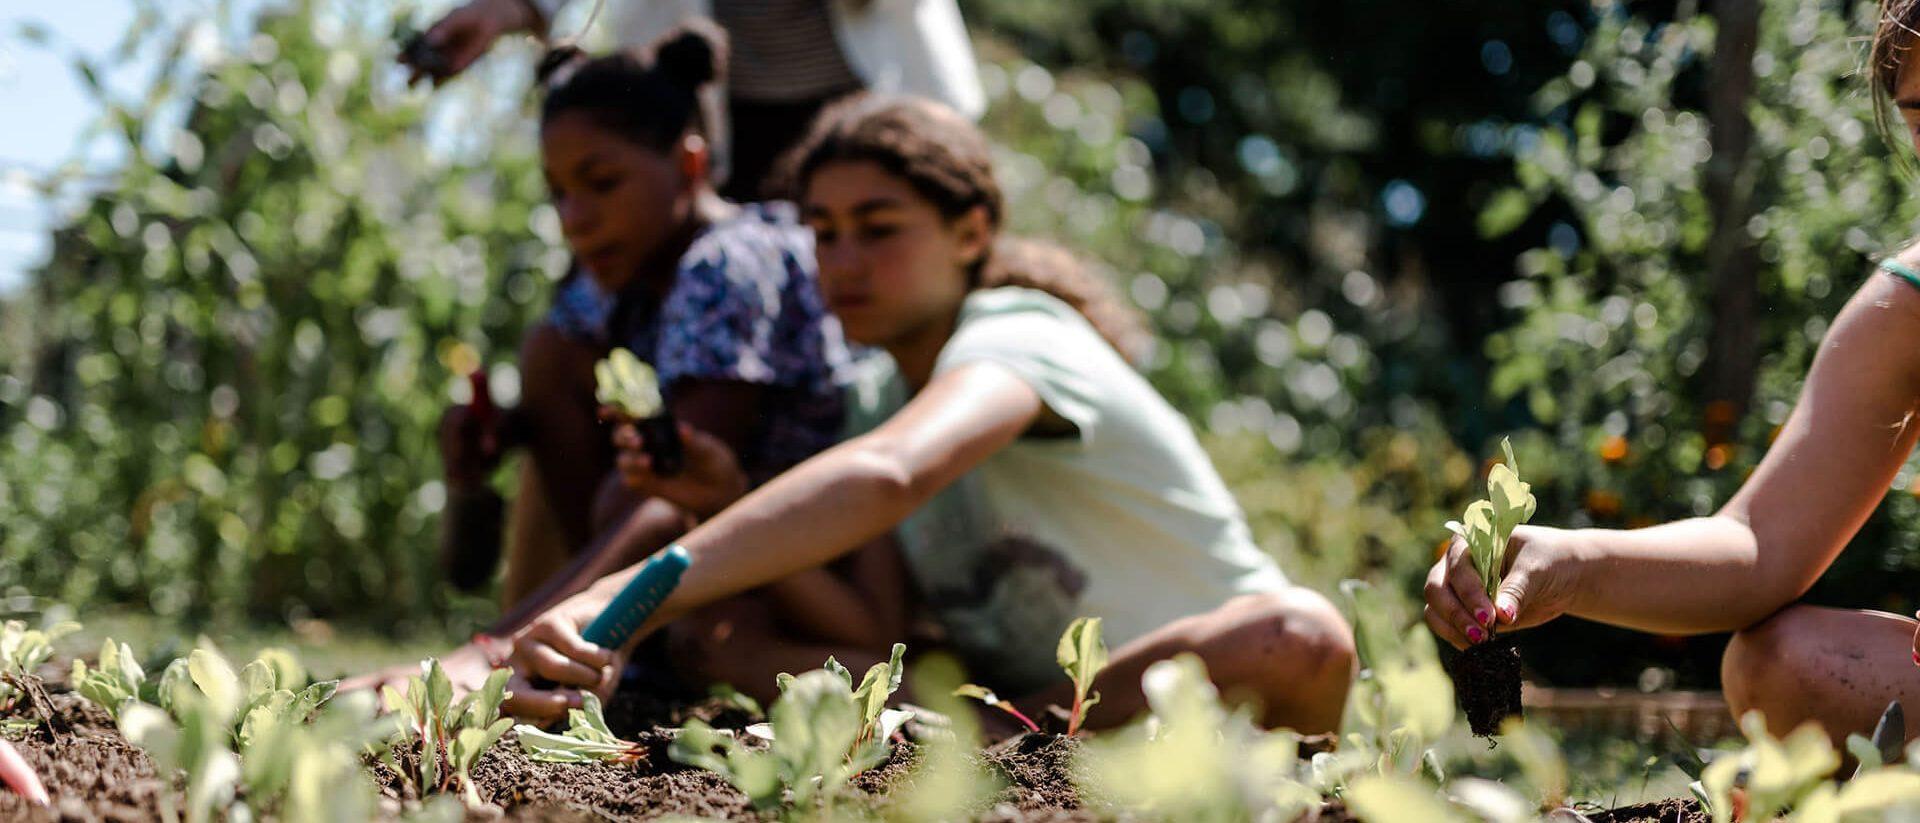 summer campers gardening